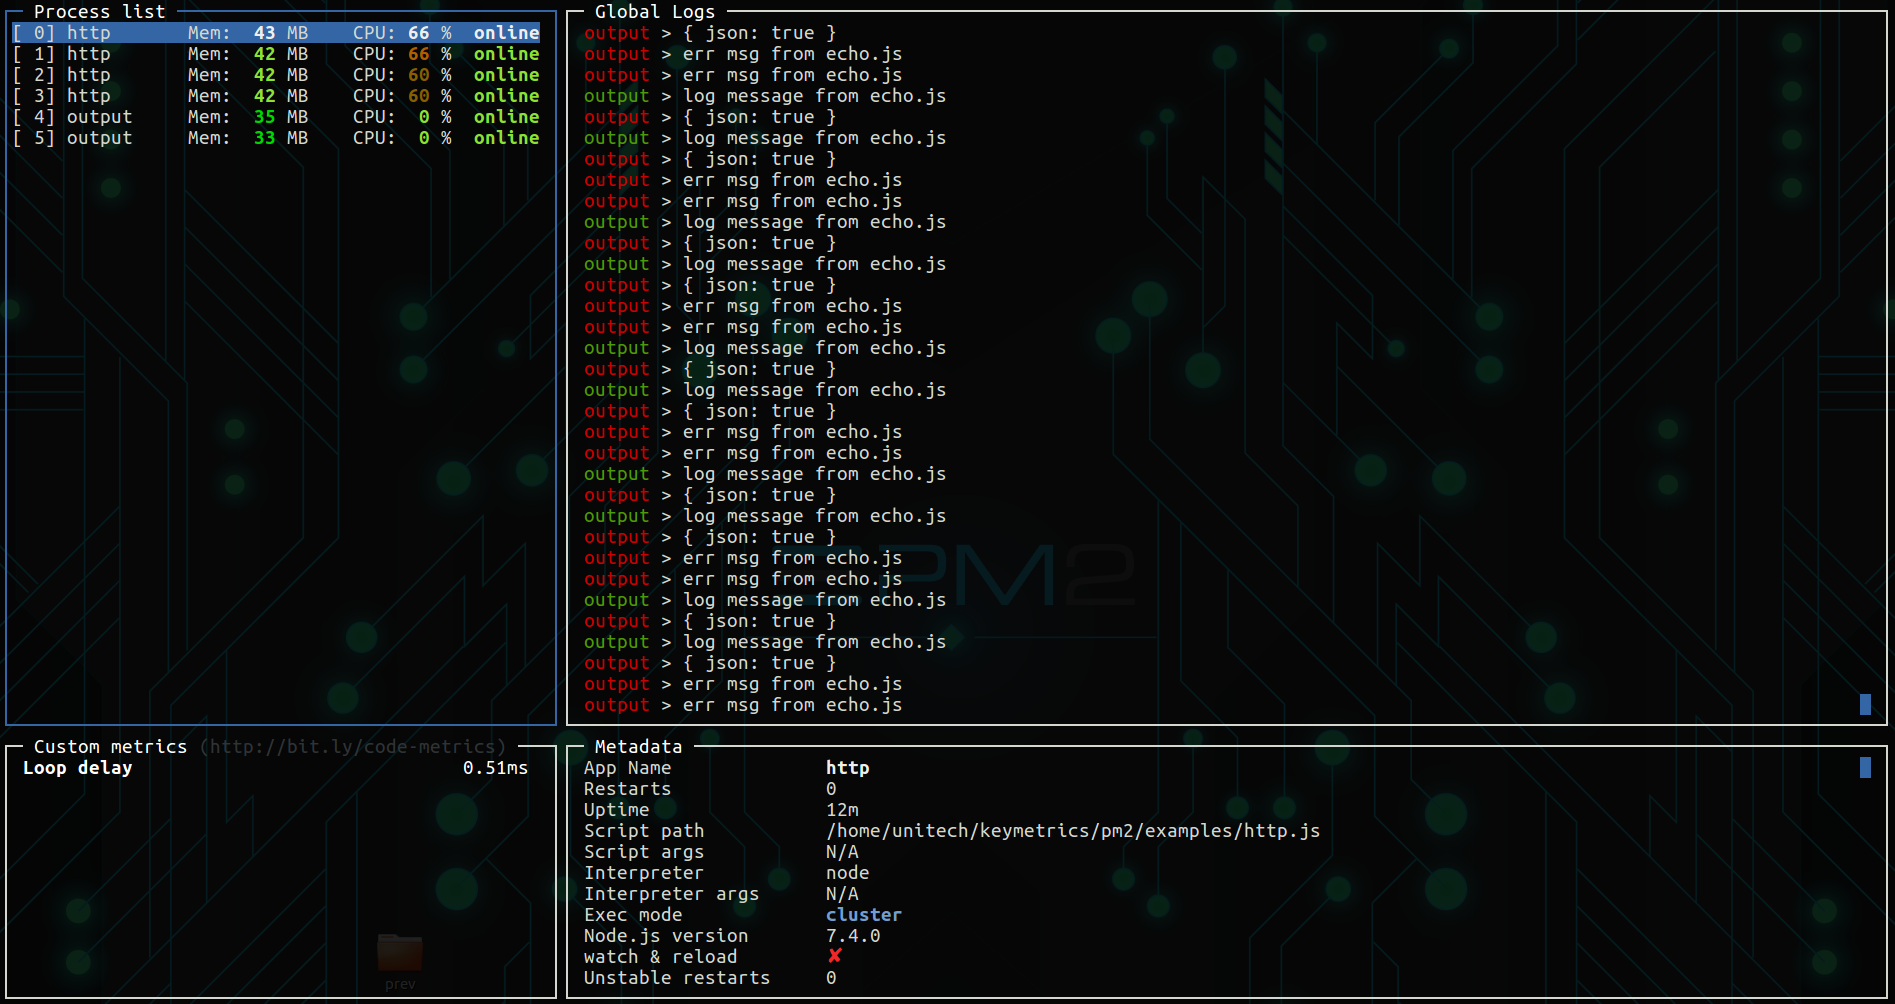 Auto start node js server on boot - Stack Overflow